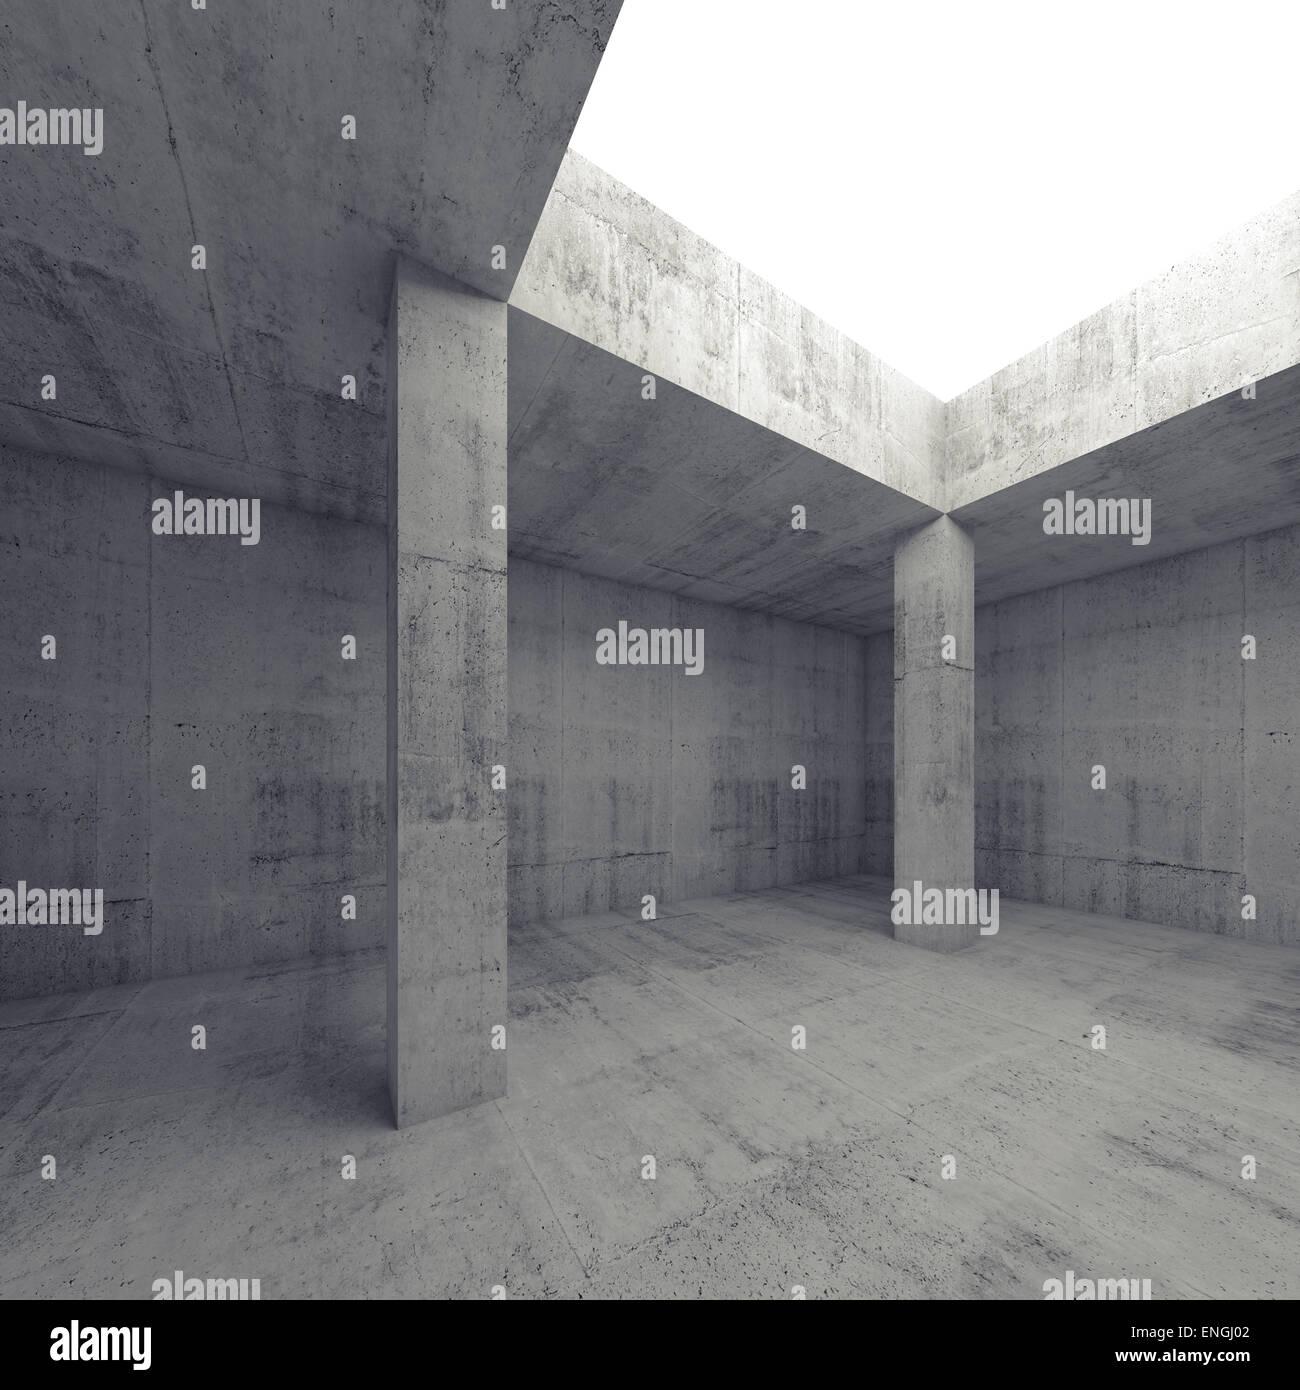 3d Architecture Monochrome Abstract White Stockfotos & 3d ...